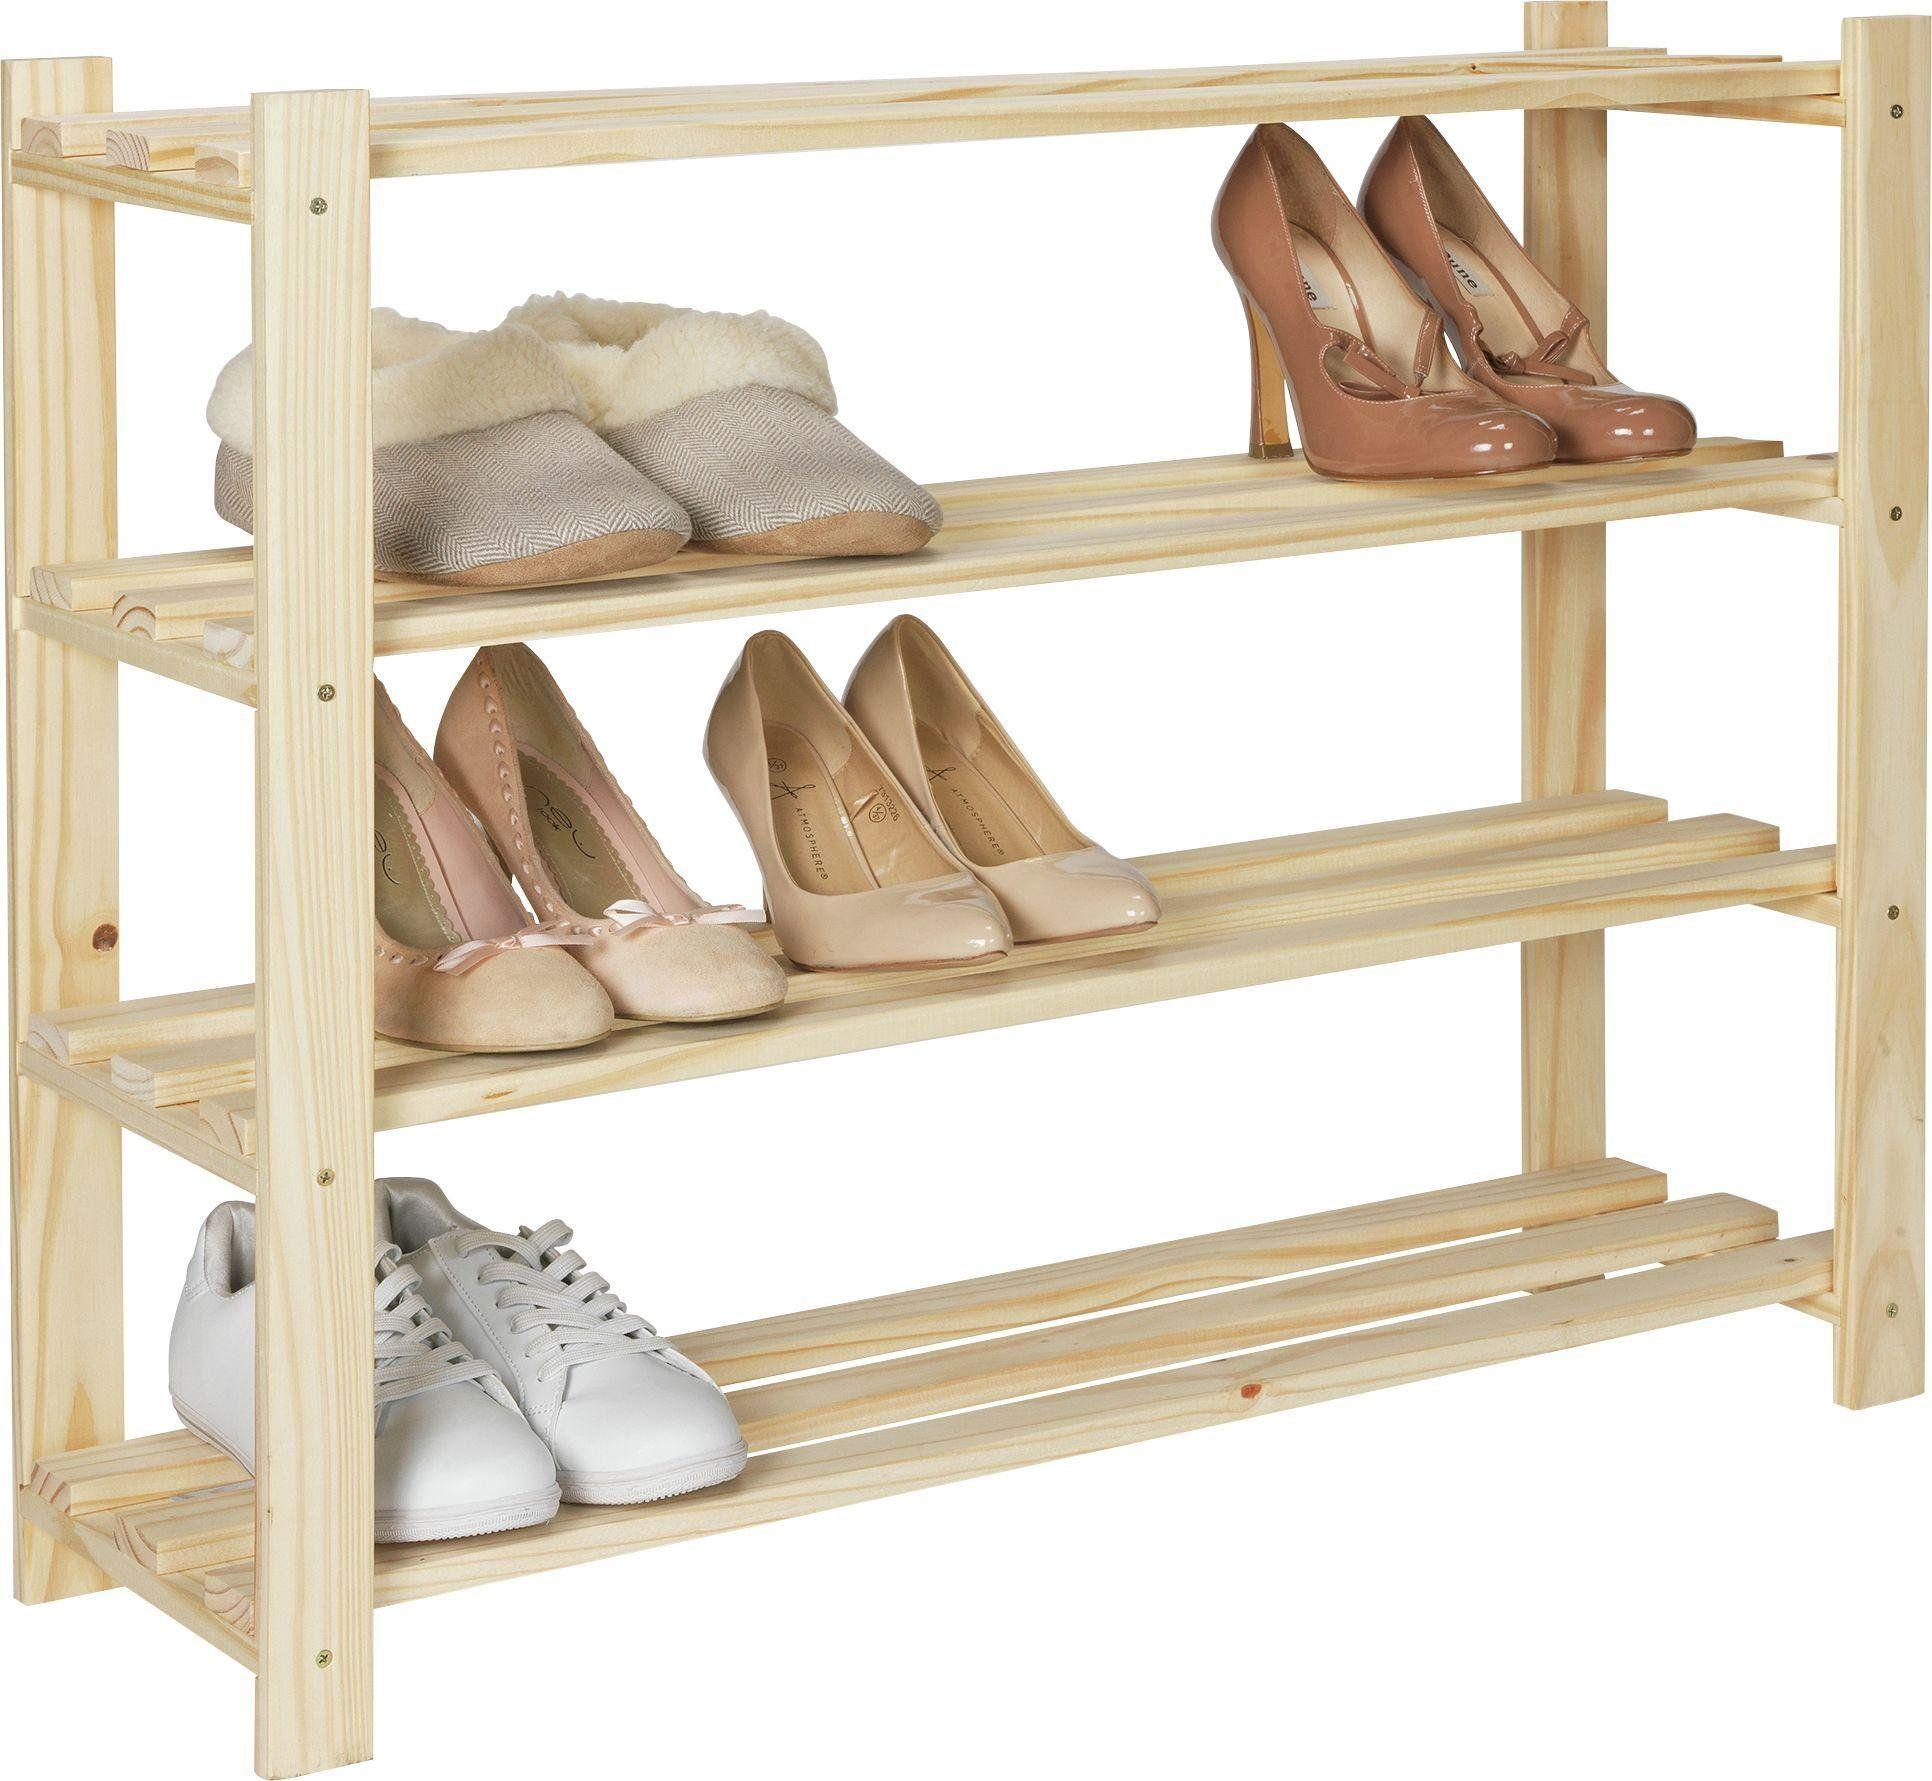 Hallway furniture shoe storage  argos uk HOME  Shelf Shoe Storage Rack  Solid Unfinished Pine